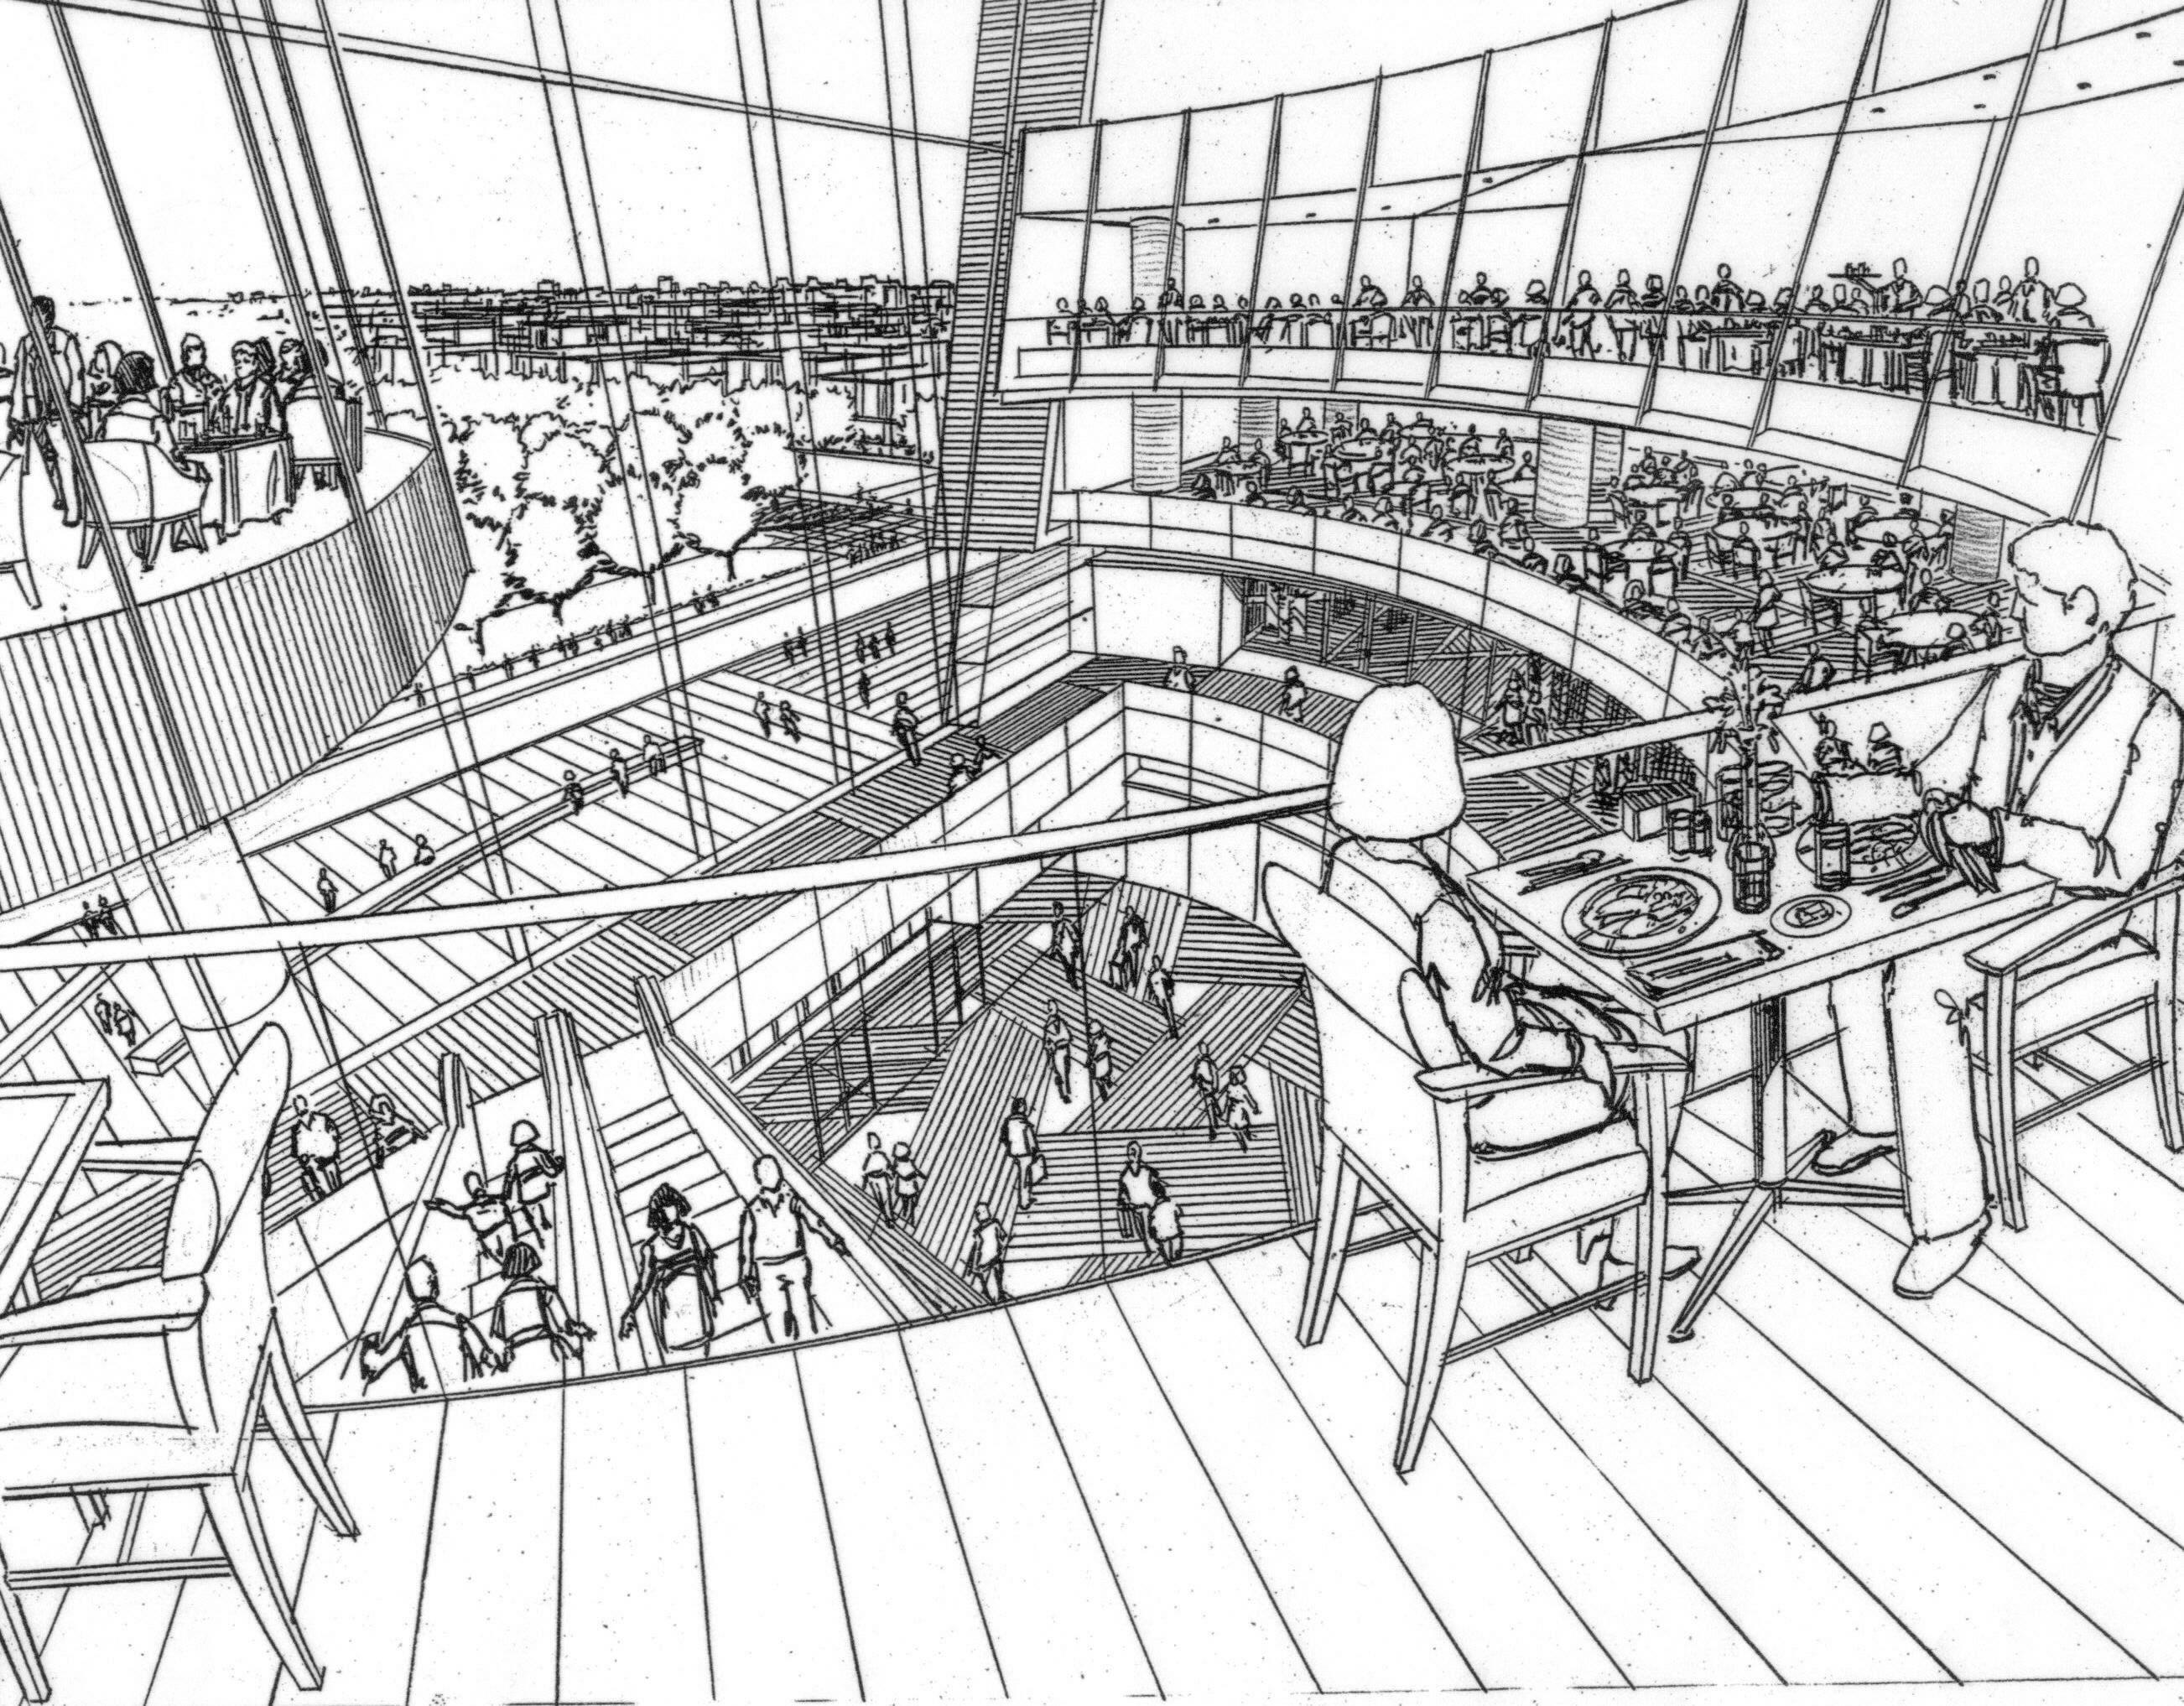 Preliminary sketch of retail mall interior. Black